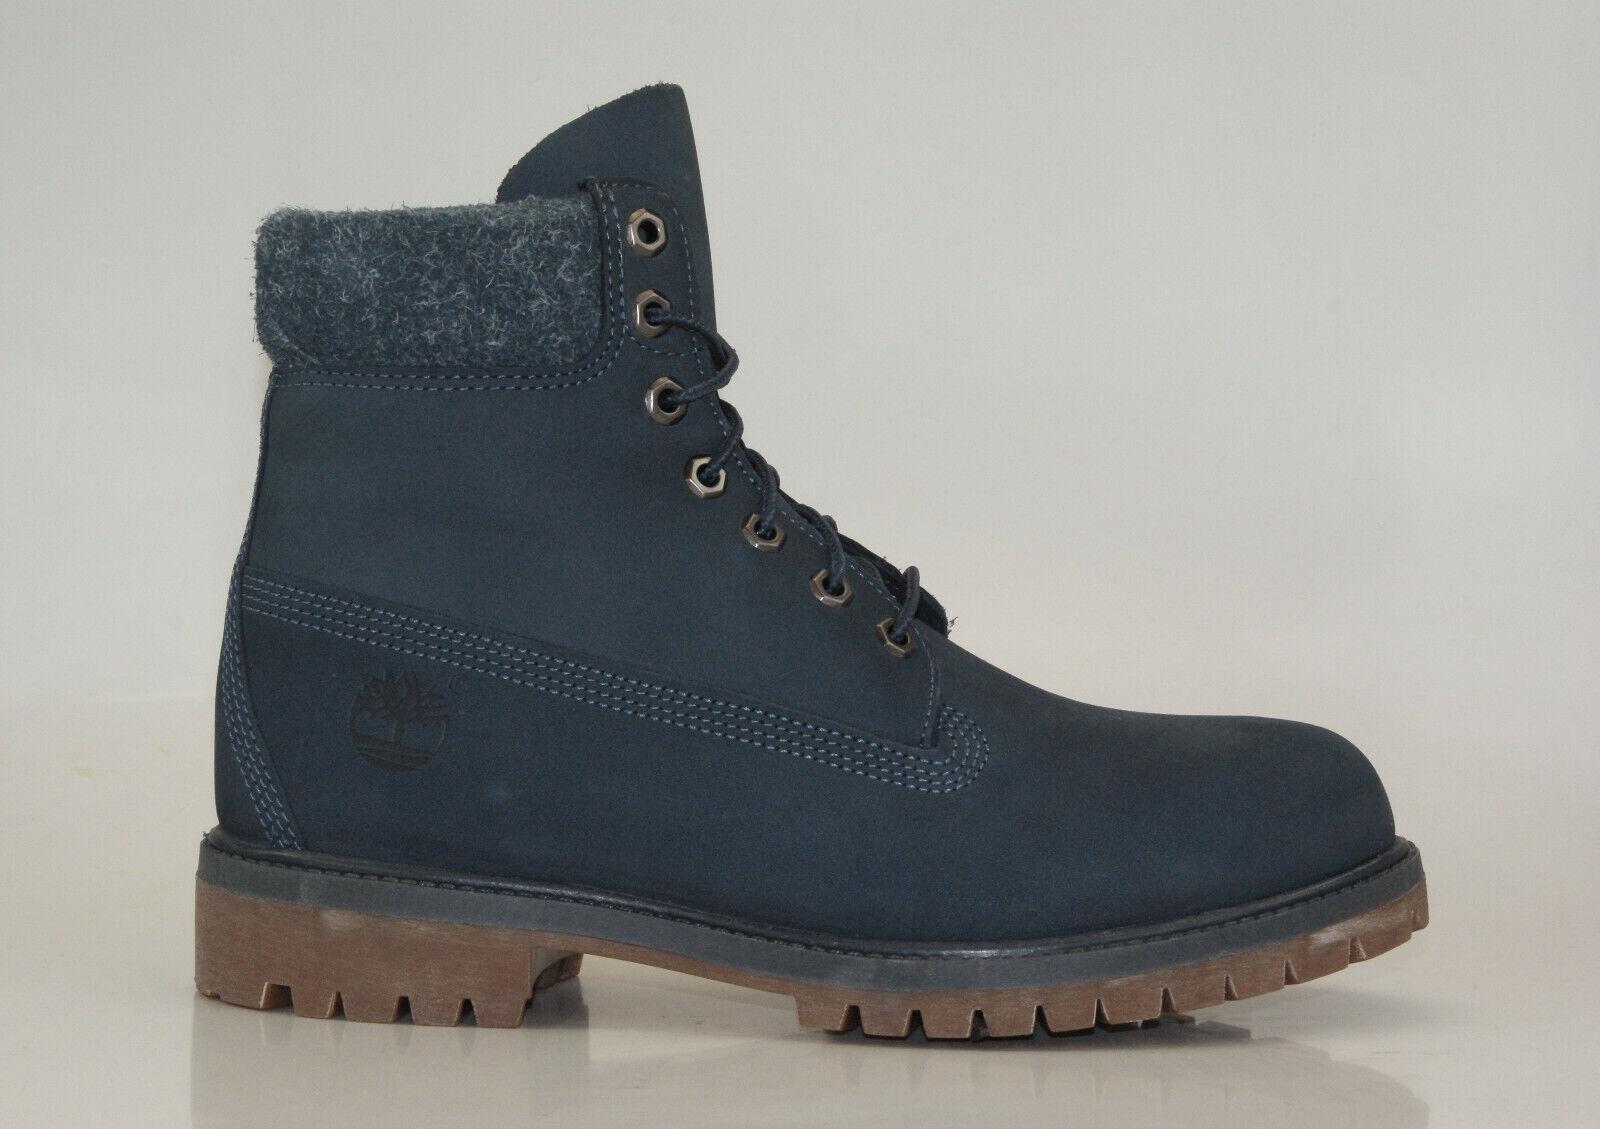 Timberland 6 Inch Premium Boots Size 45 US 11W Waterproof Lace up Boots A1UEU